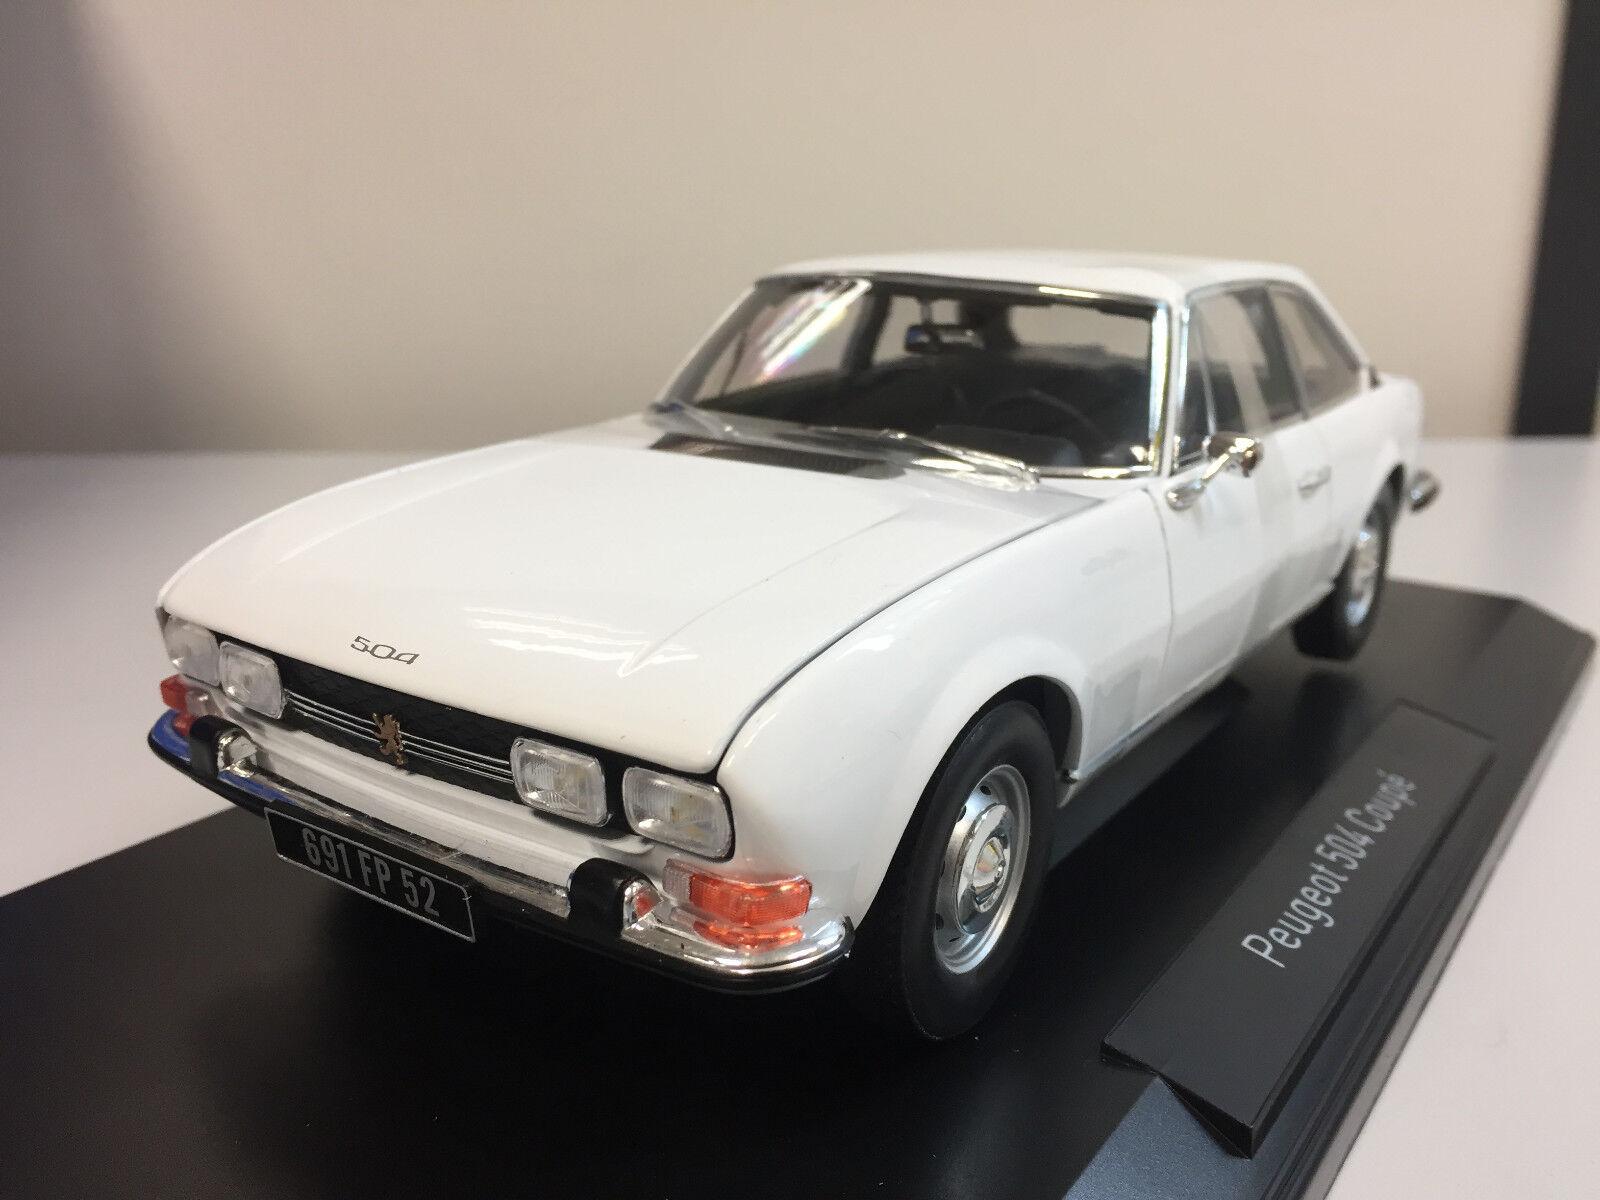 en venta en línea Norev Peugeot 504 Coupé Coupé Coupé 1969 blanco 1 18 184825 6  genuina alta calidad